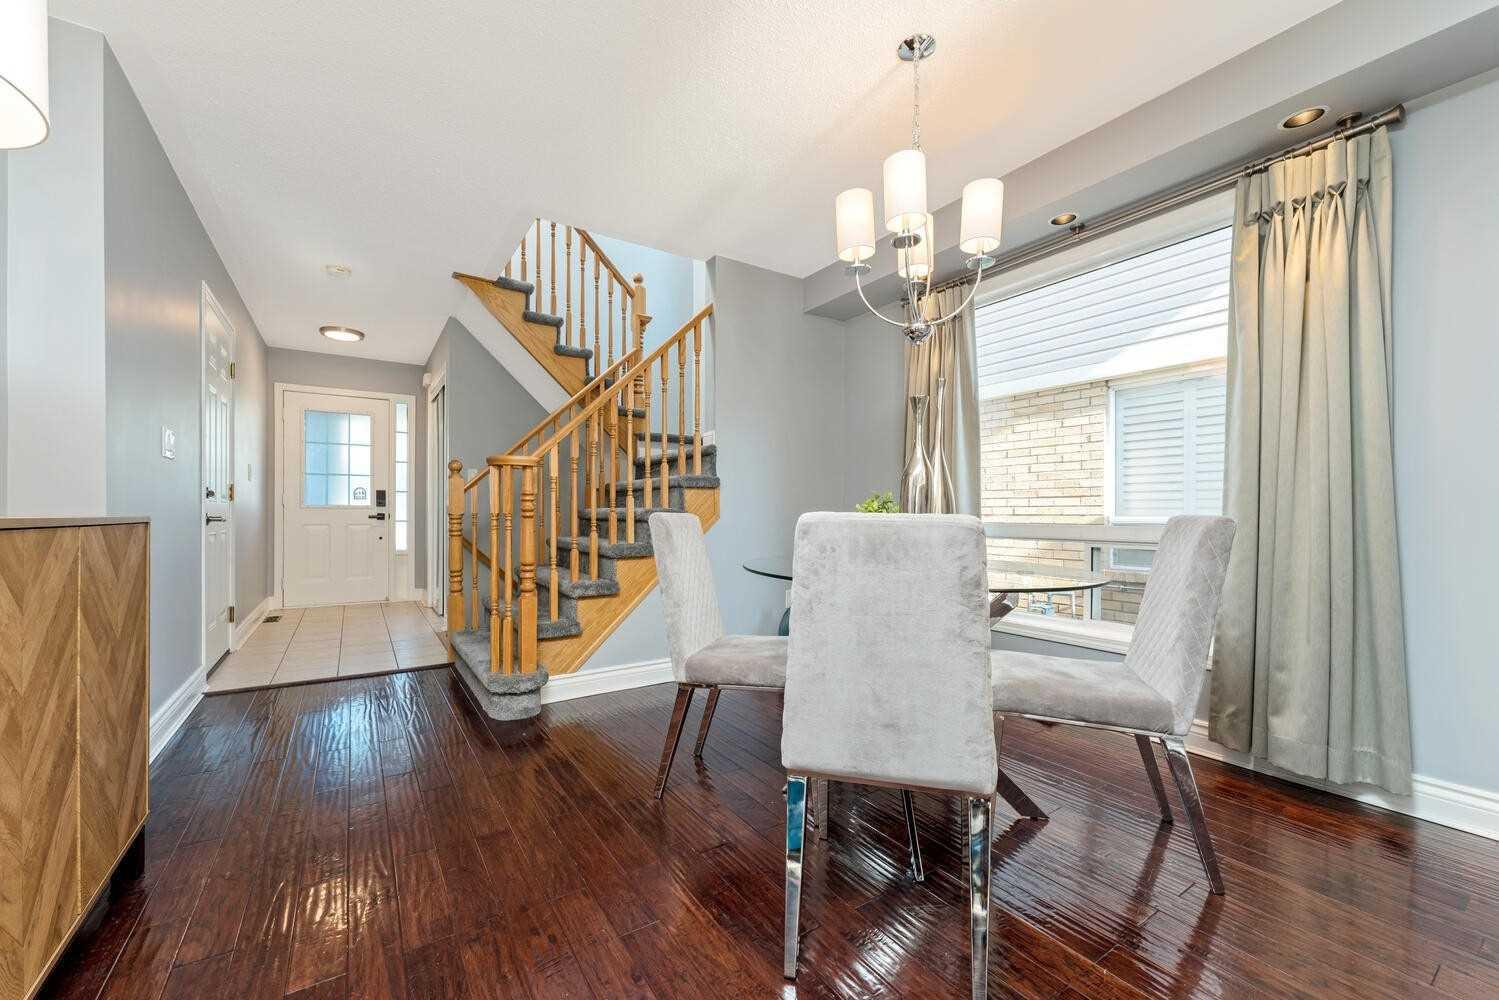 1030 Barclay Circ - Beaty Att/Row/Twnhouse for sale, 3 Bedrooms (W5400435) - #4